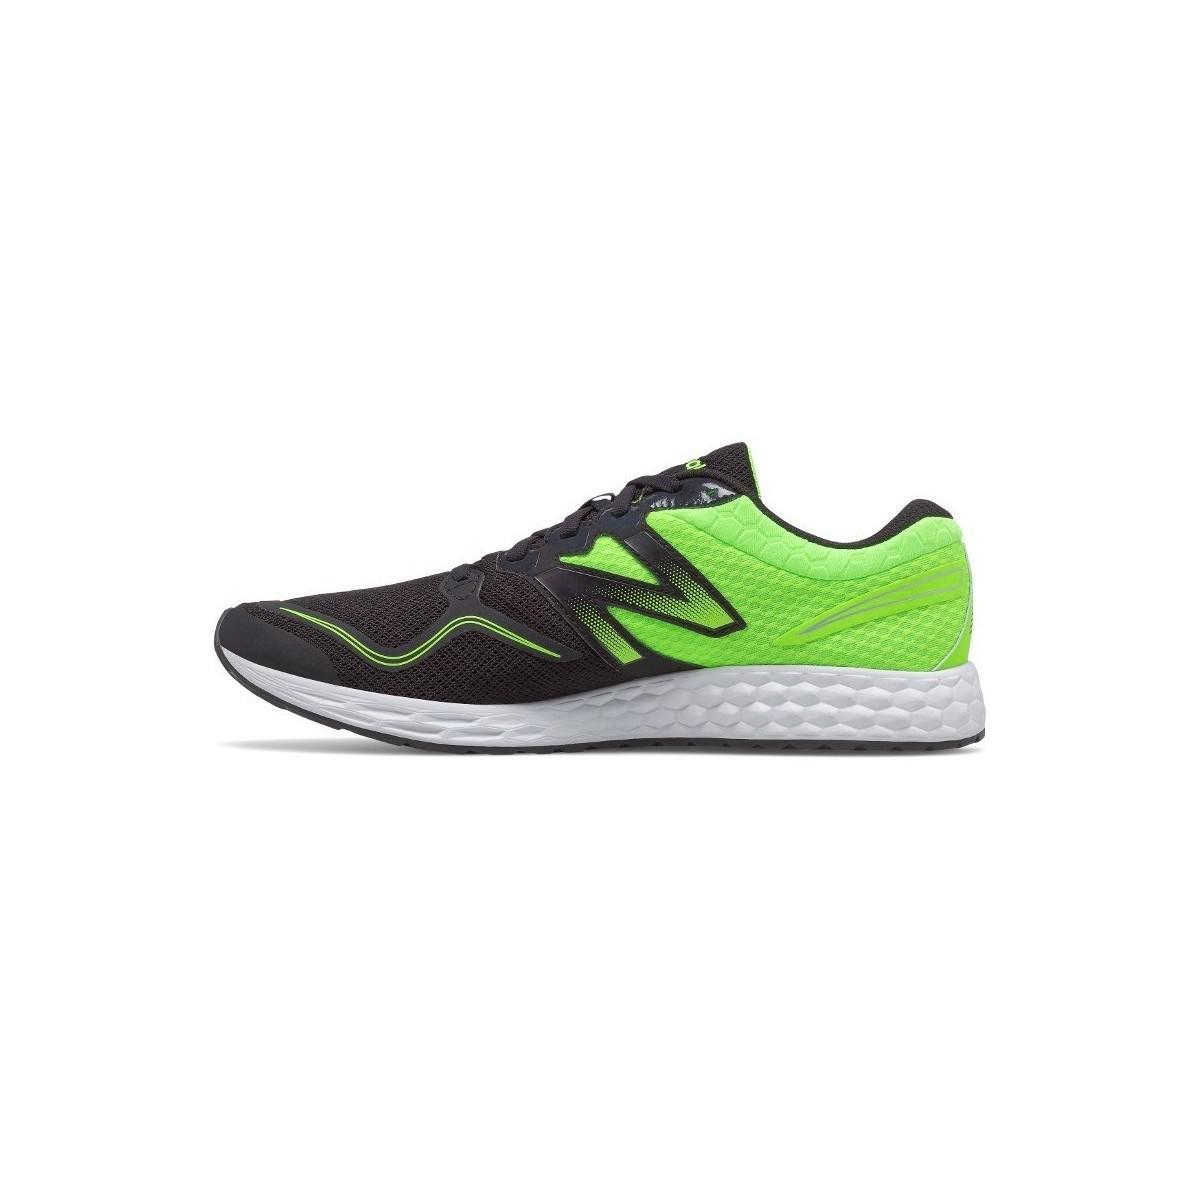 new balance 1500 made in england green nz